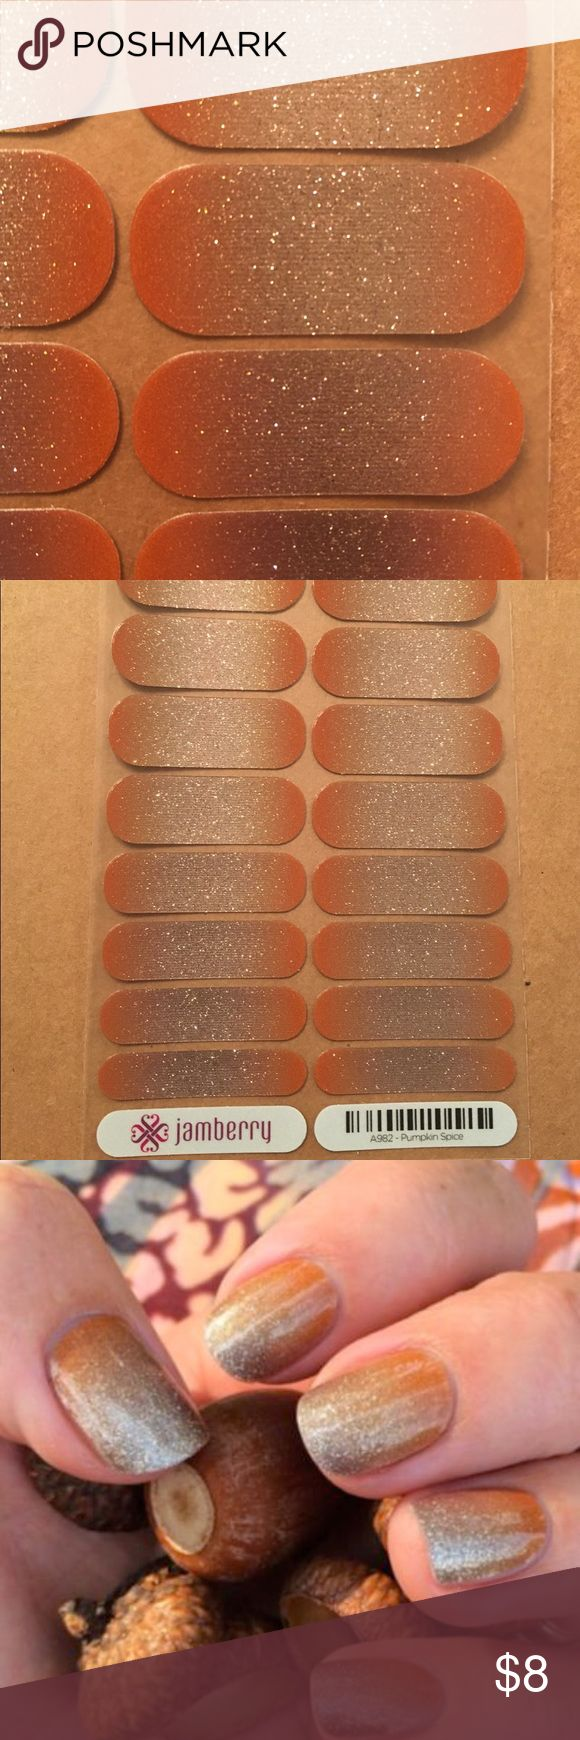 Pumpkin spice Nail wrap Full sheet of Pumpkin Spice Jamberry Nail wraps. Jamberry Other